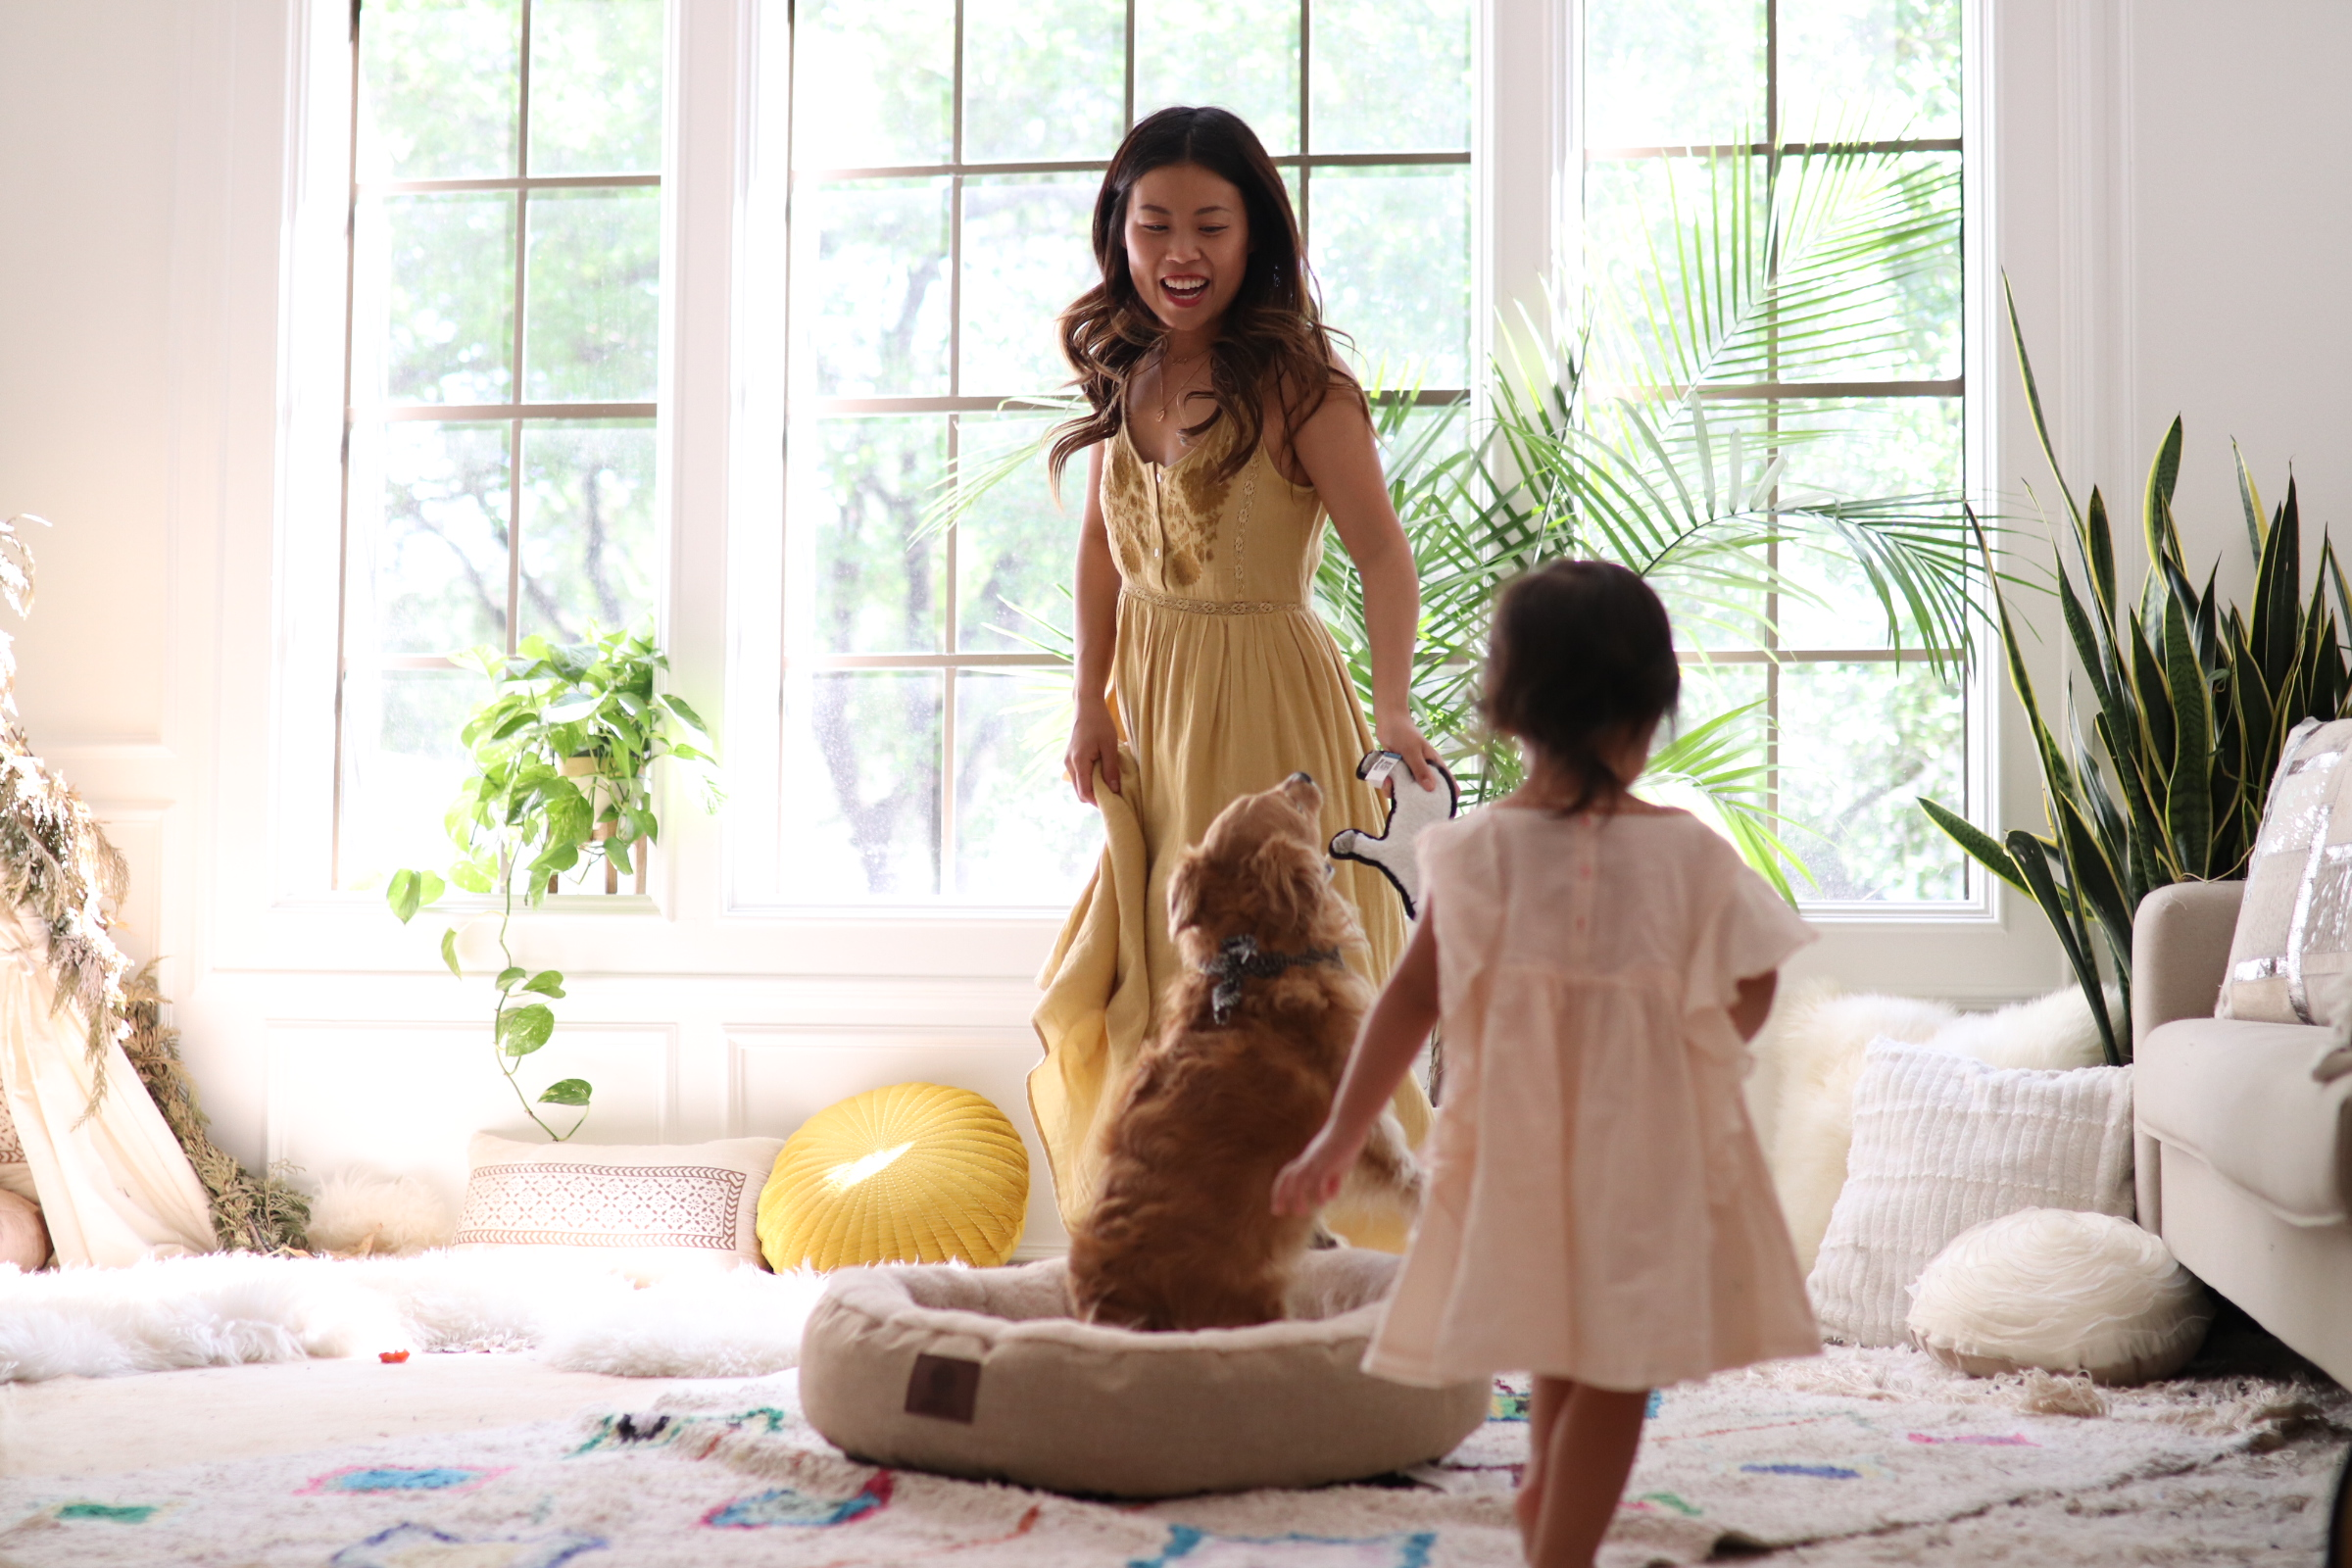 Joyfullygreen Gordman's National Pet Day Baby and Puppy Love-19.jpg